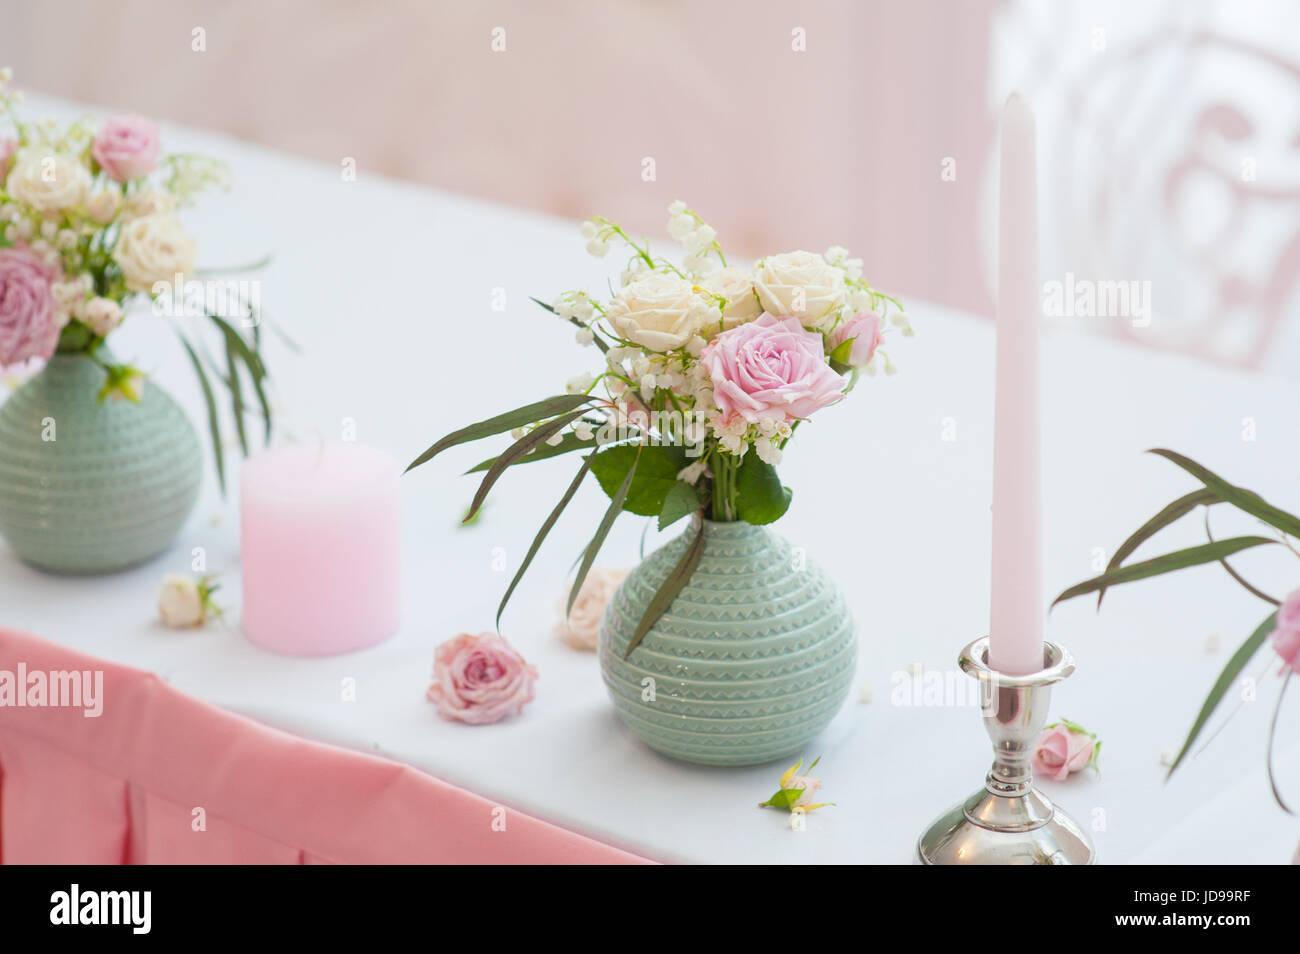 Wedding festive decor bouquet from spring flowers table layout wedding festive decor bouquet from spring flowers table layout table of newly married restaurant interior mightylinksfo